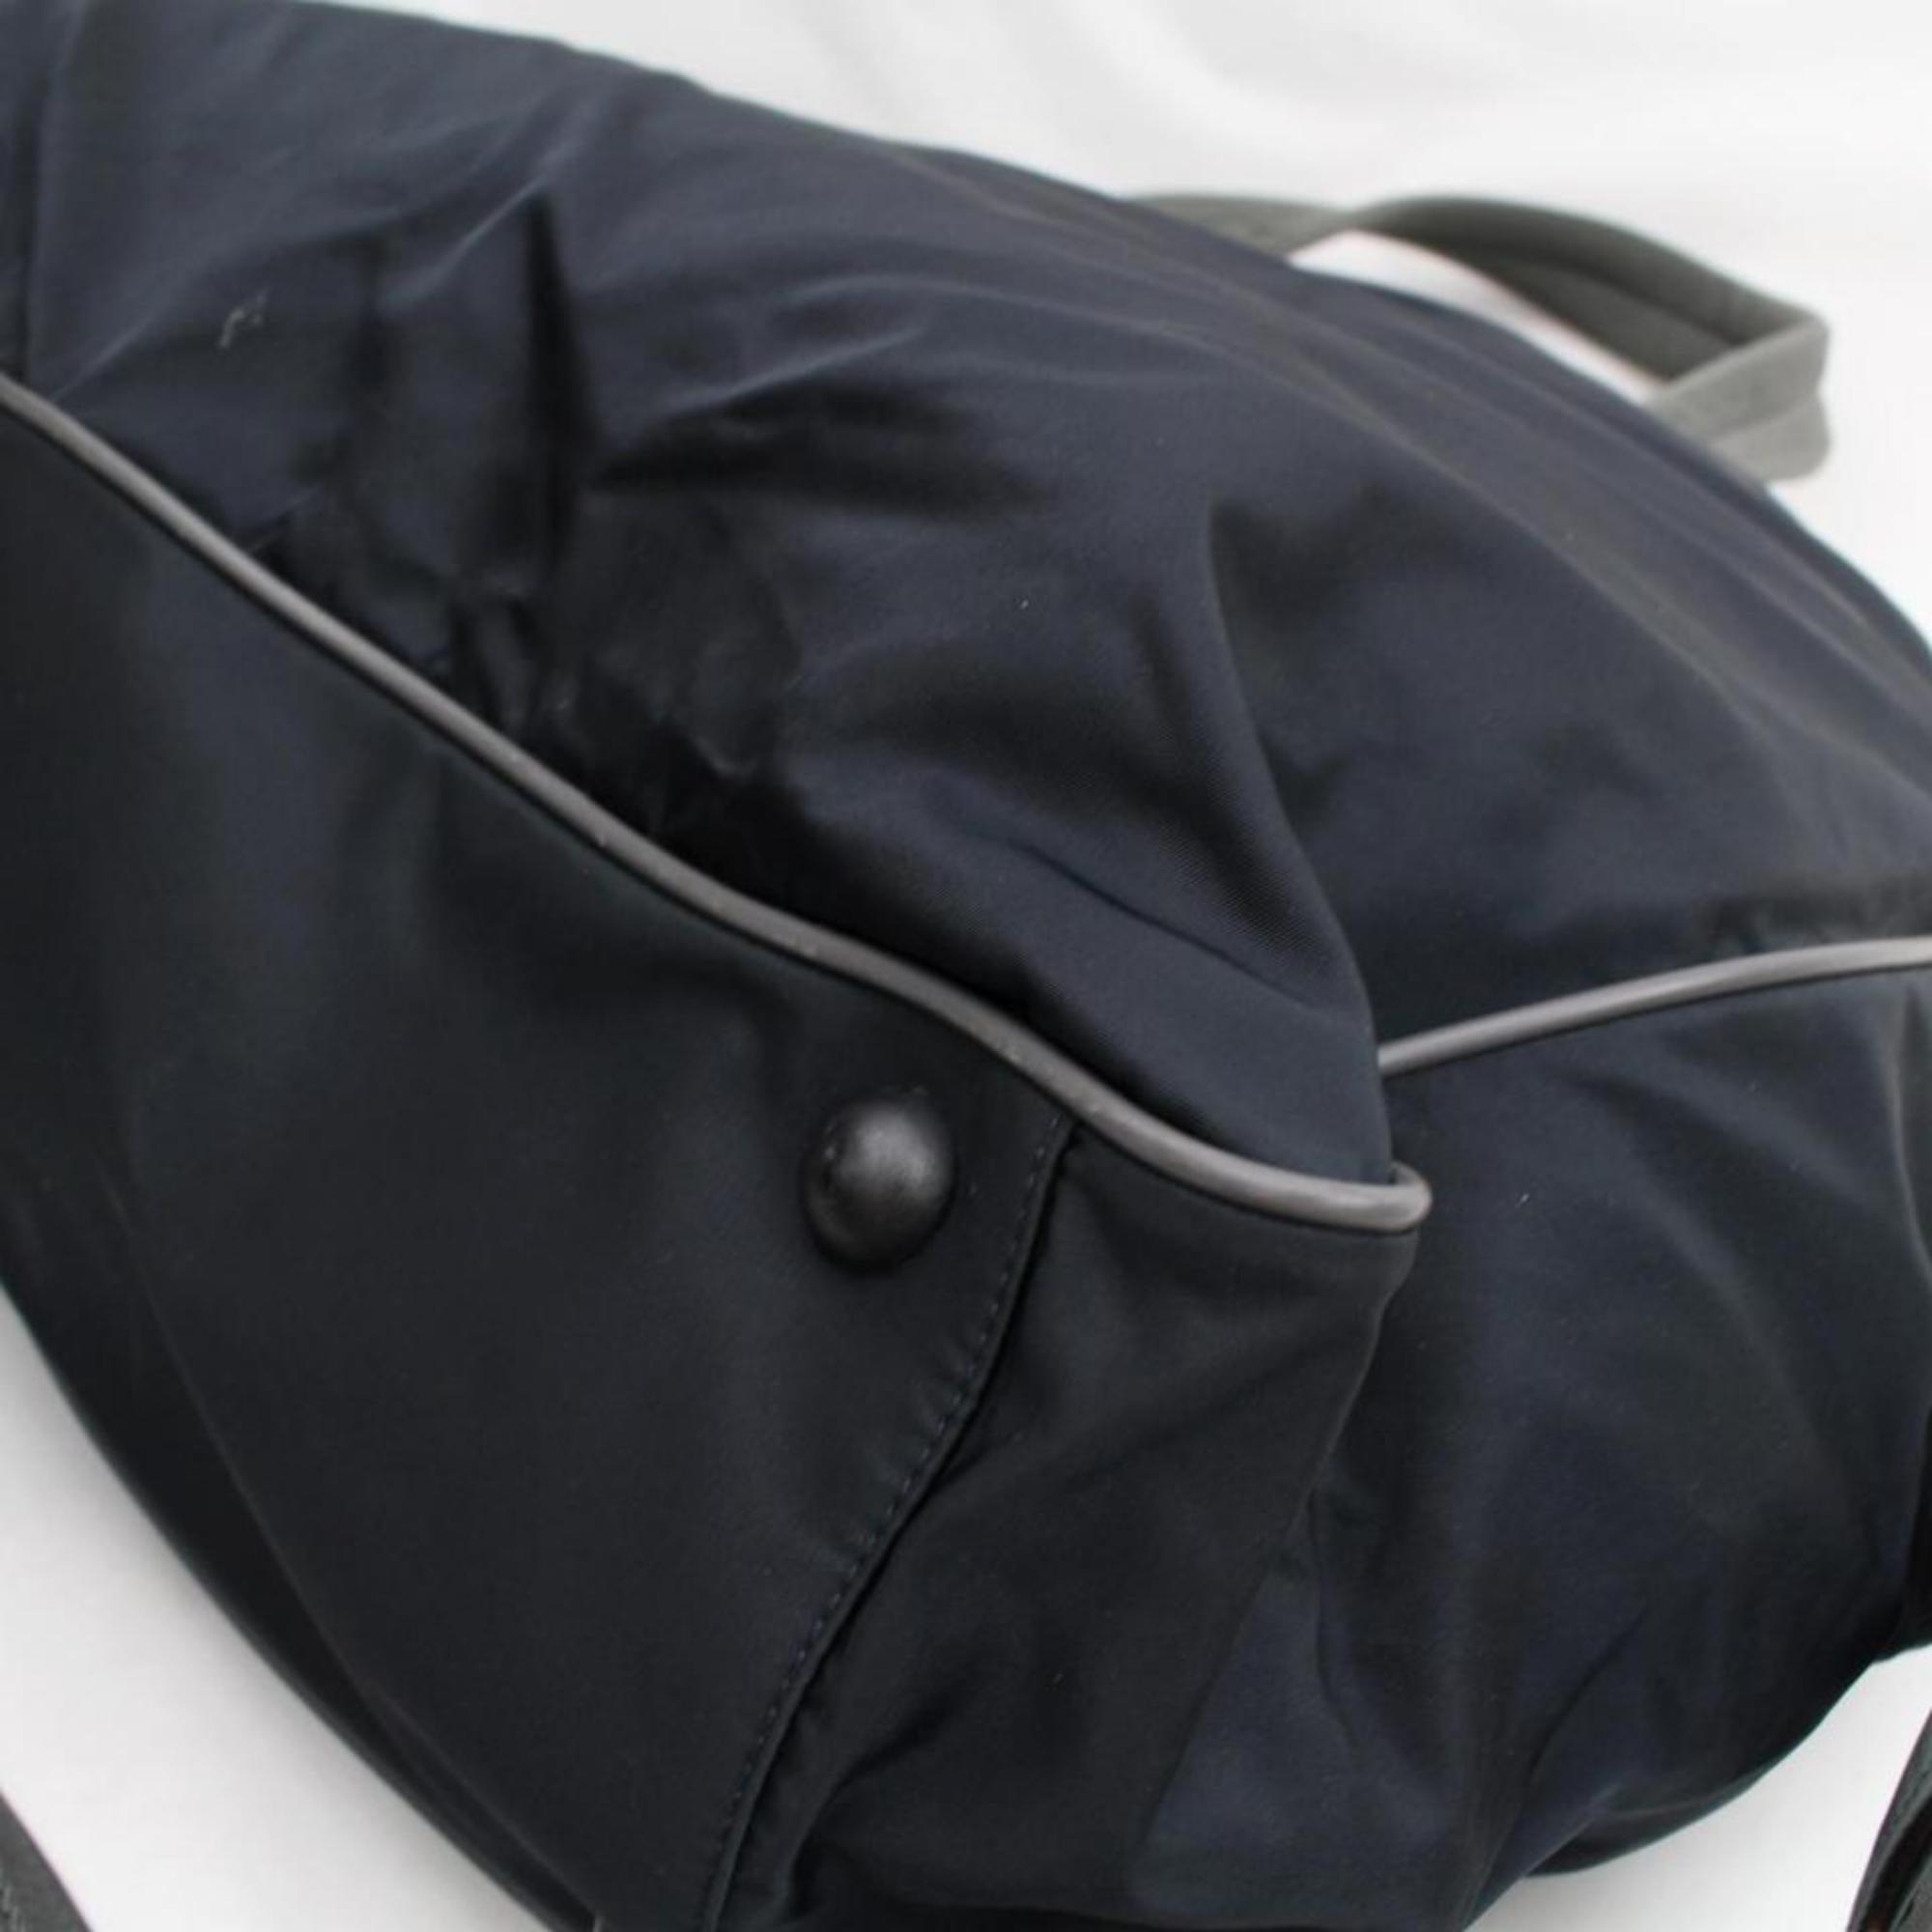 d75c39726e29 Prada Tessuto Sports 2way 868066 Black Nylon Weekend/Travel Bag For Sale at  1stdibs